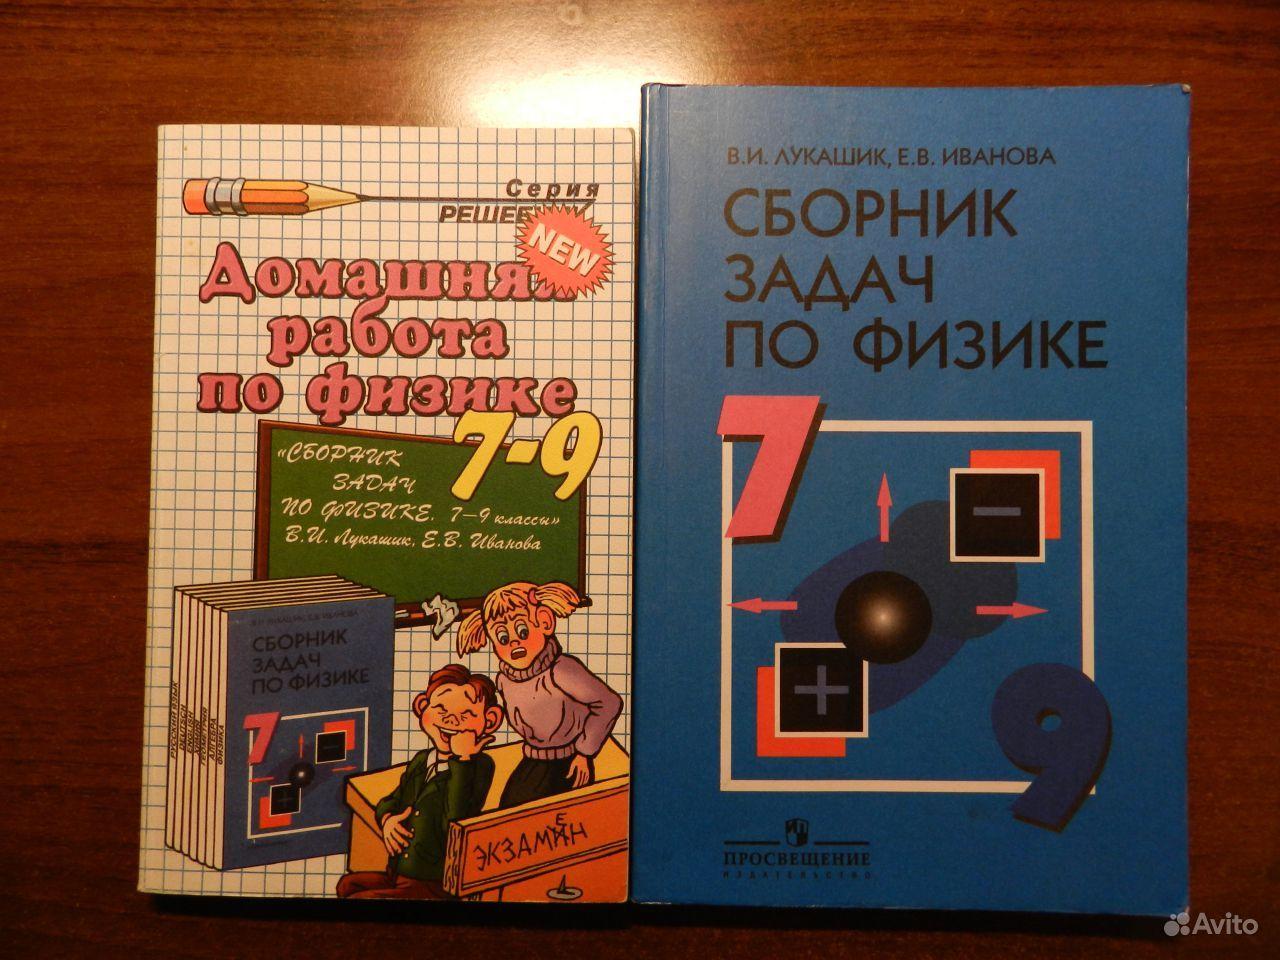 Задачник По Физике В И Лукашик 7-9 Класс Решебник